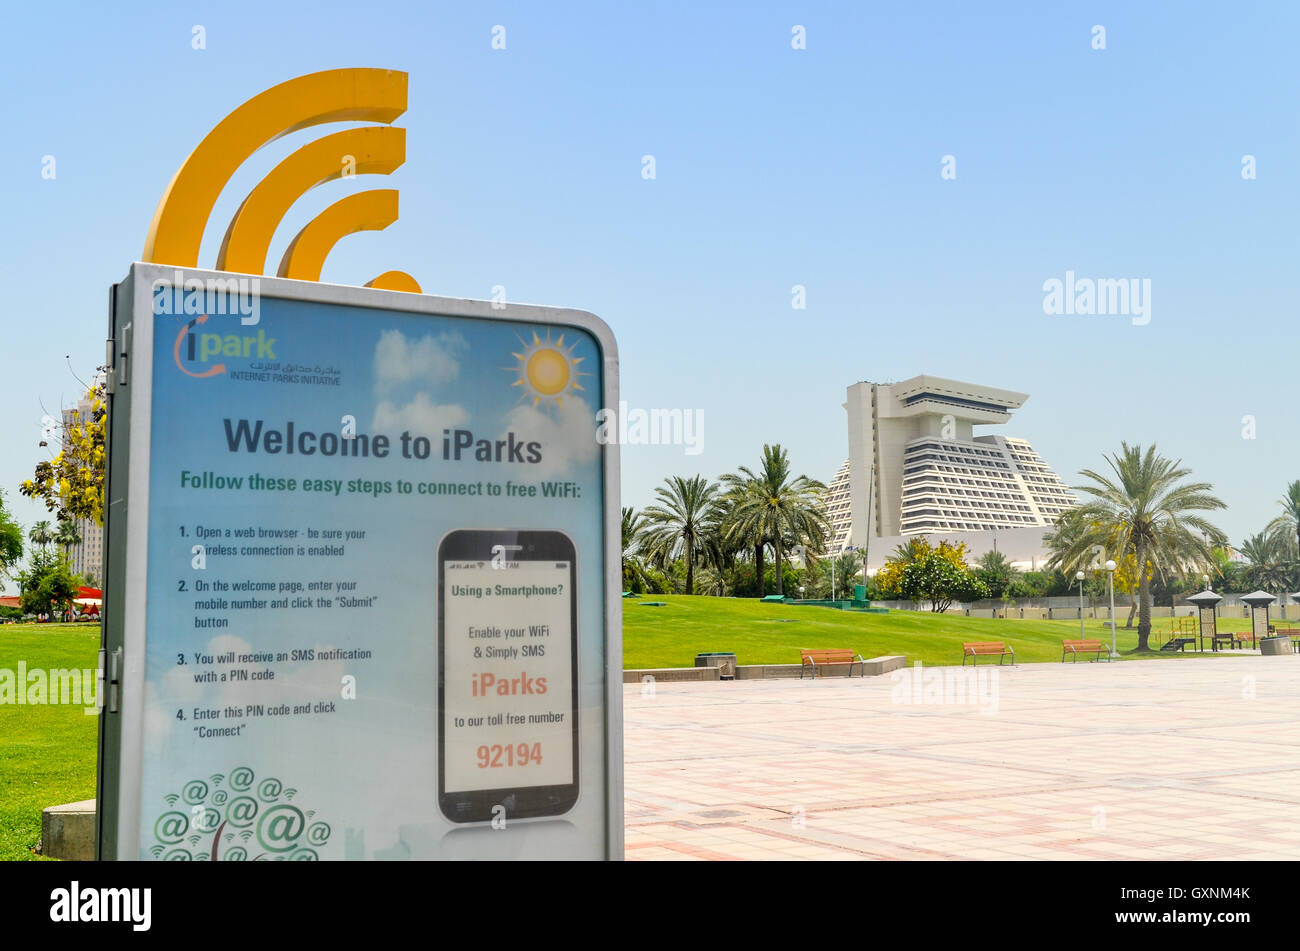 Wifi gratis en Doha, Qatar, en frente del hotel Sheraton Imagen De Stock